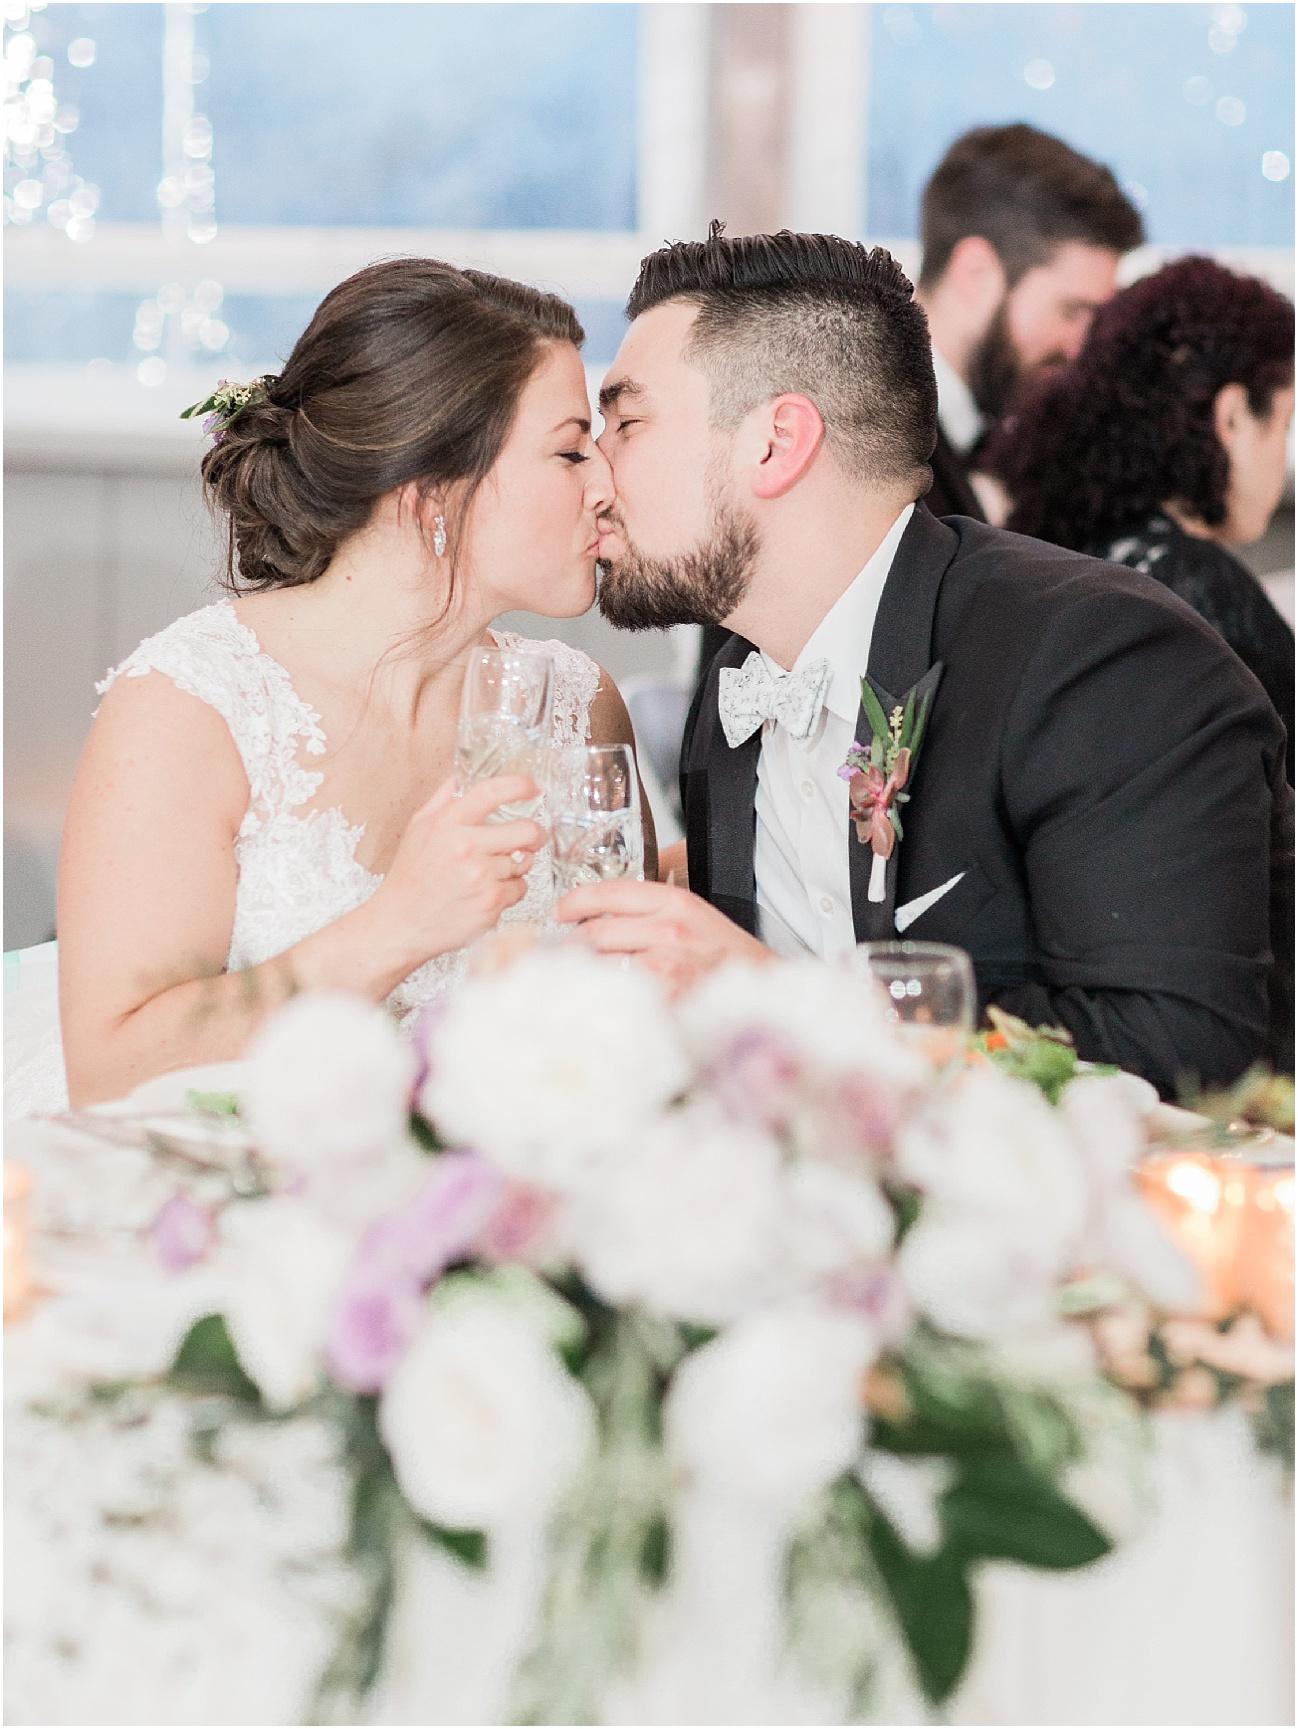 courtney_kurt_cape_cod_popponessett_inn_dowses_beach_boston_wedding_meredith_jane_photography_photo_0076.jpg